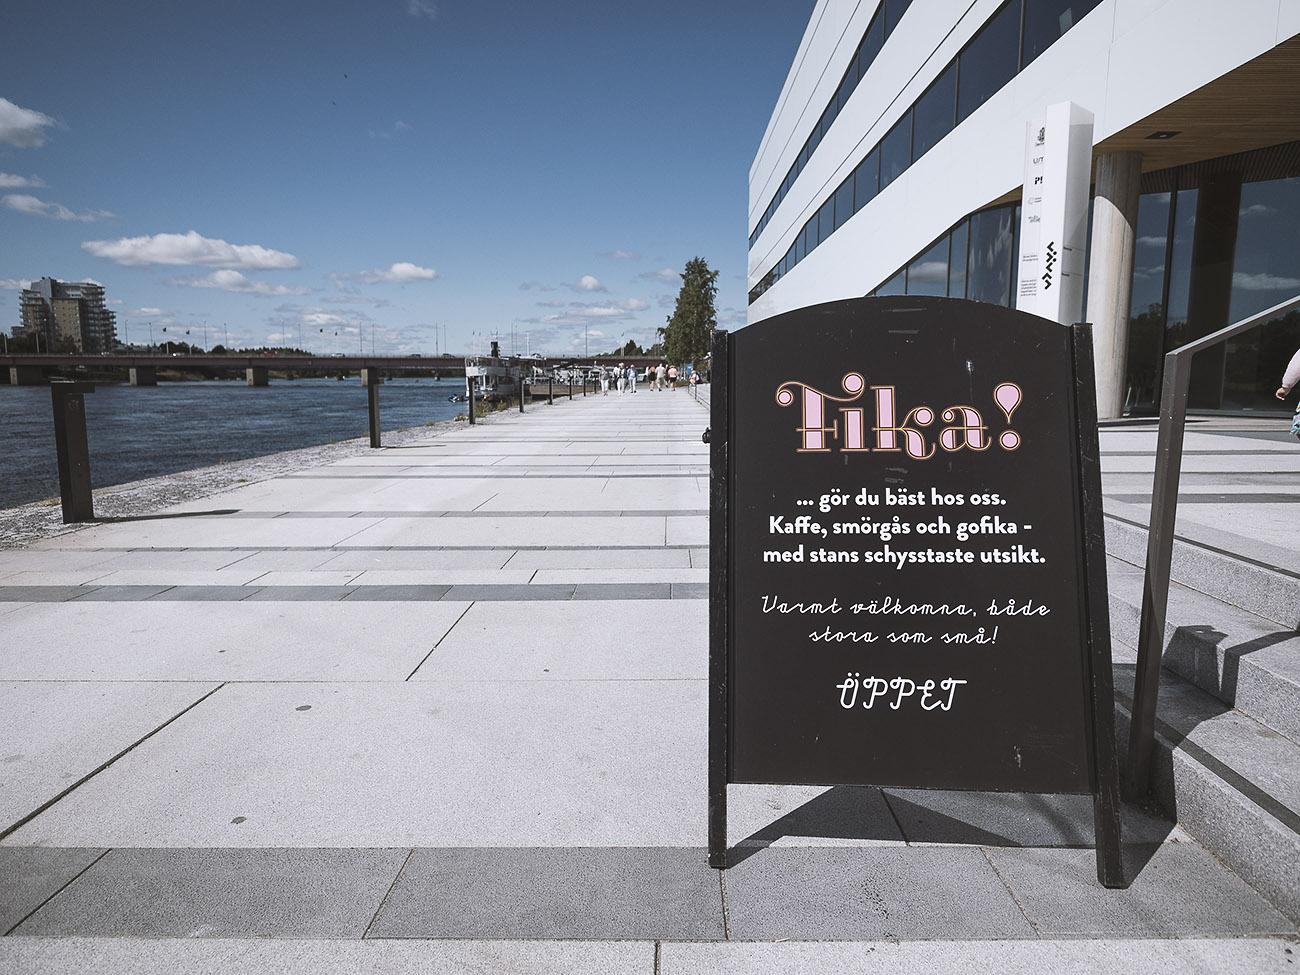 Kaffee & Kuchen (Fika) in Umeå